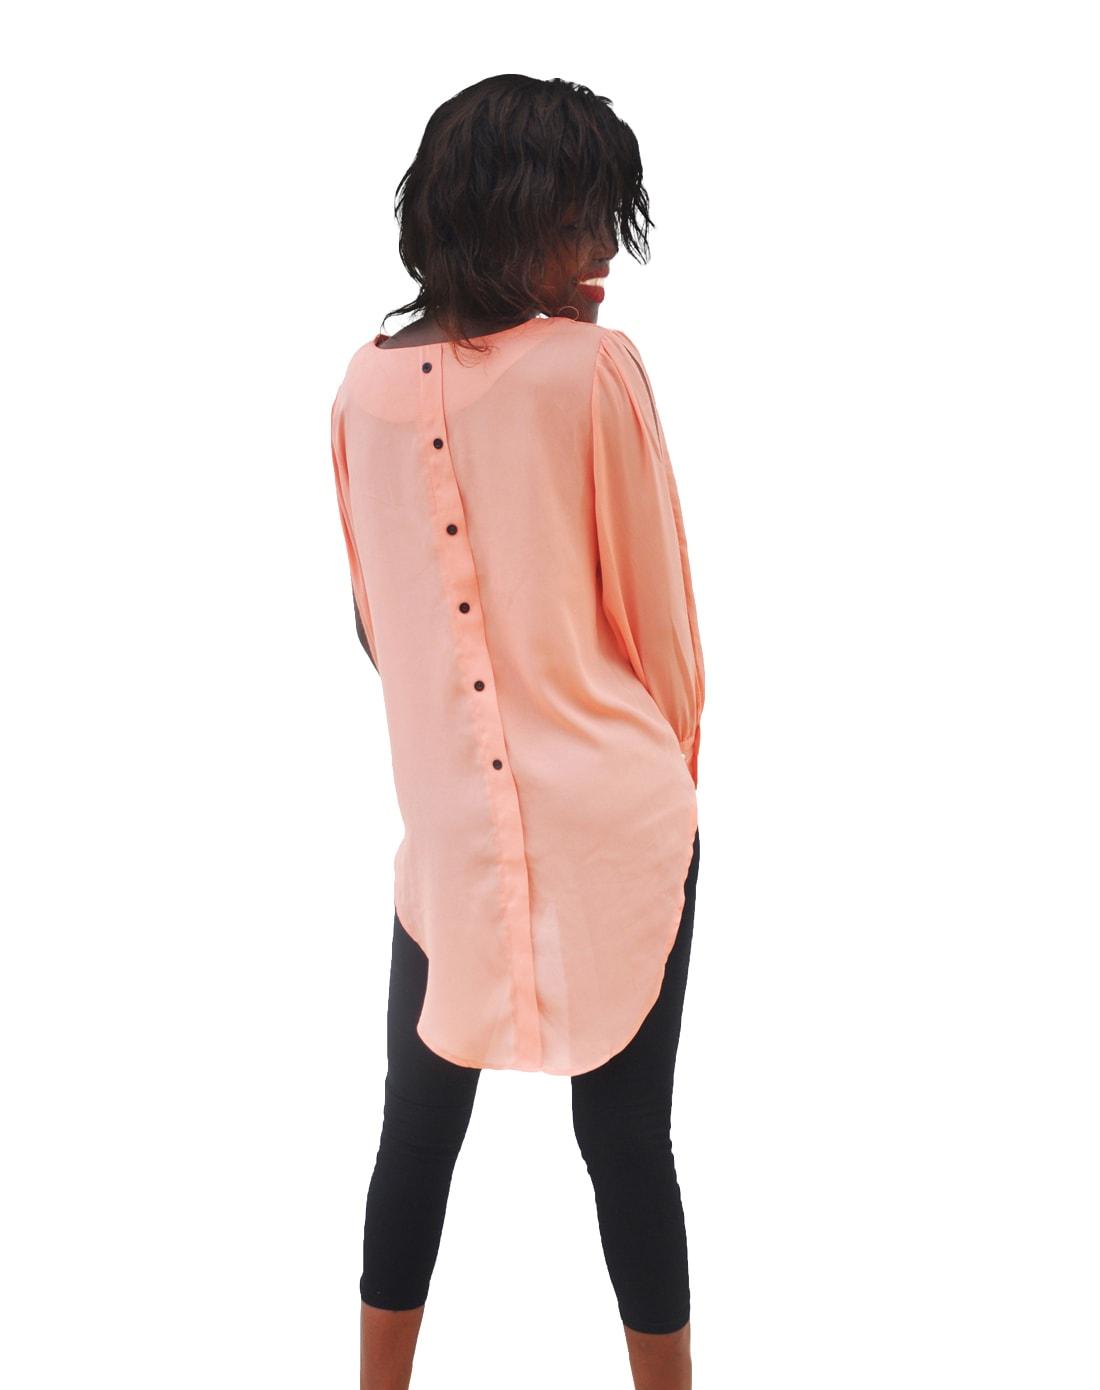 M0290 peach3 Blouses Tops Shirts maureens.com boutique